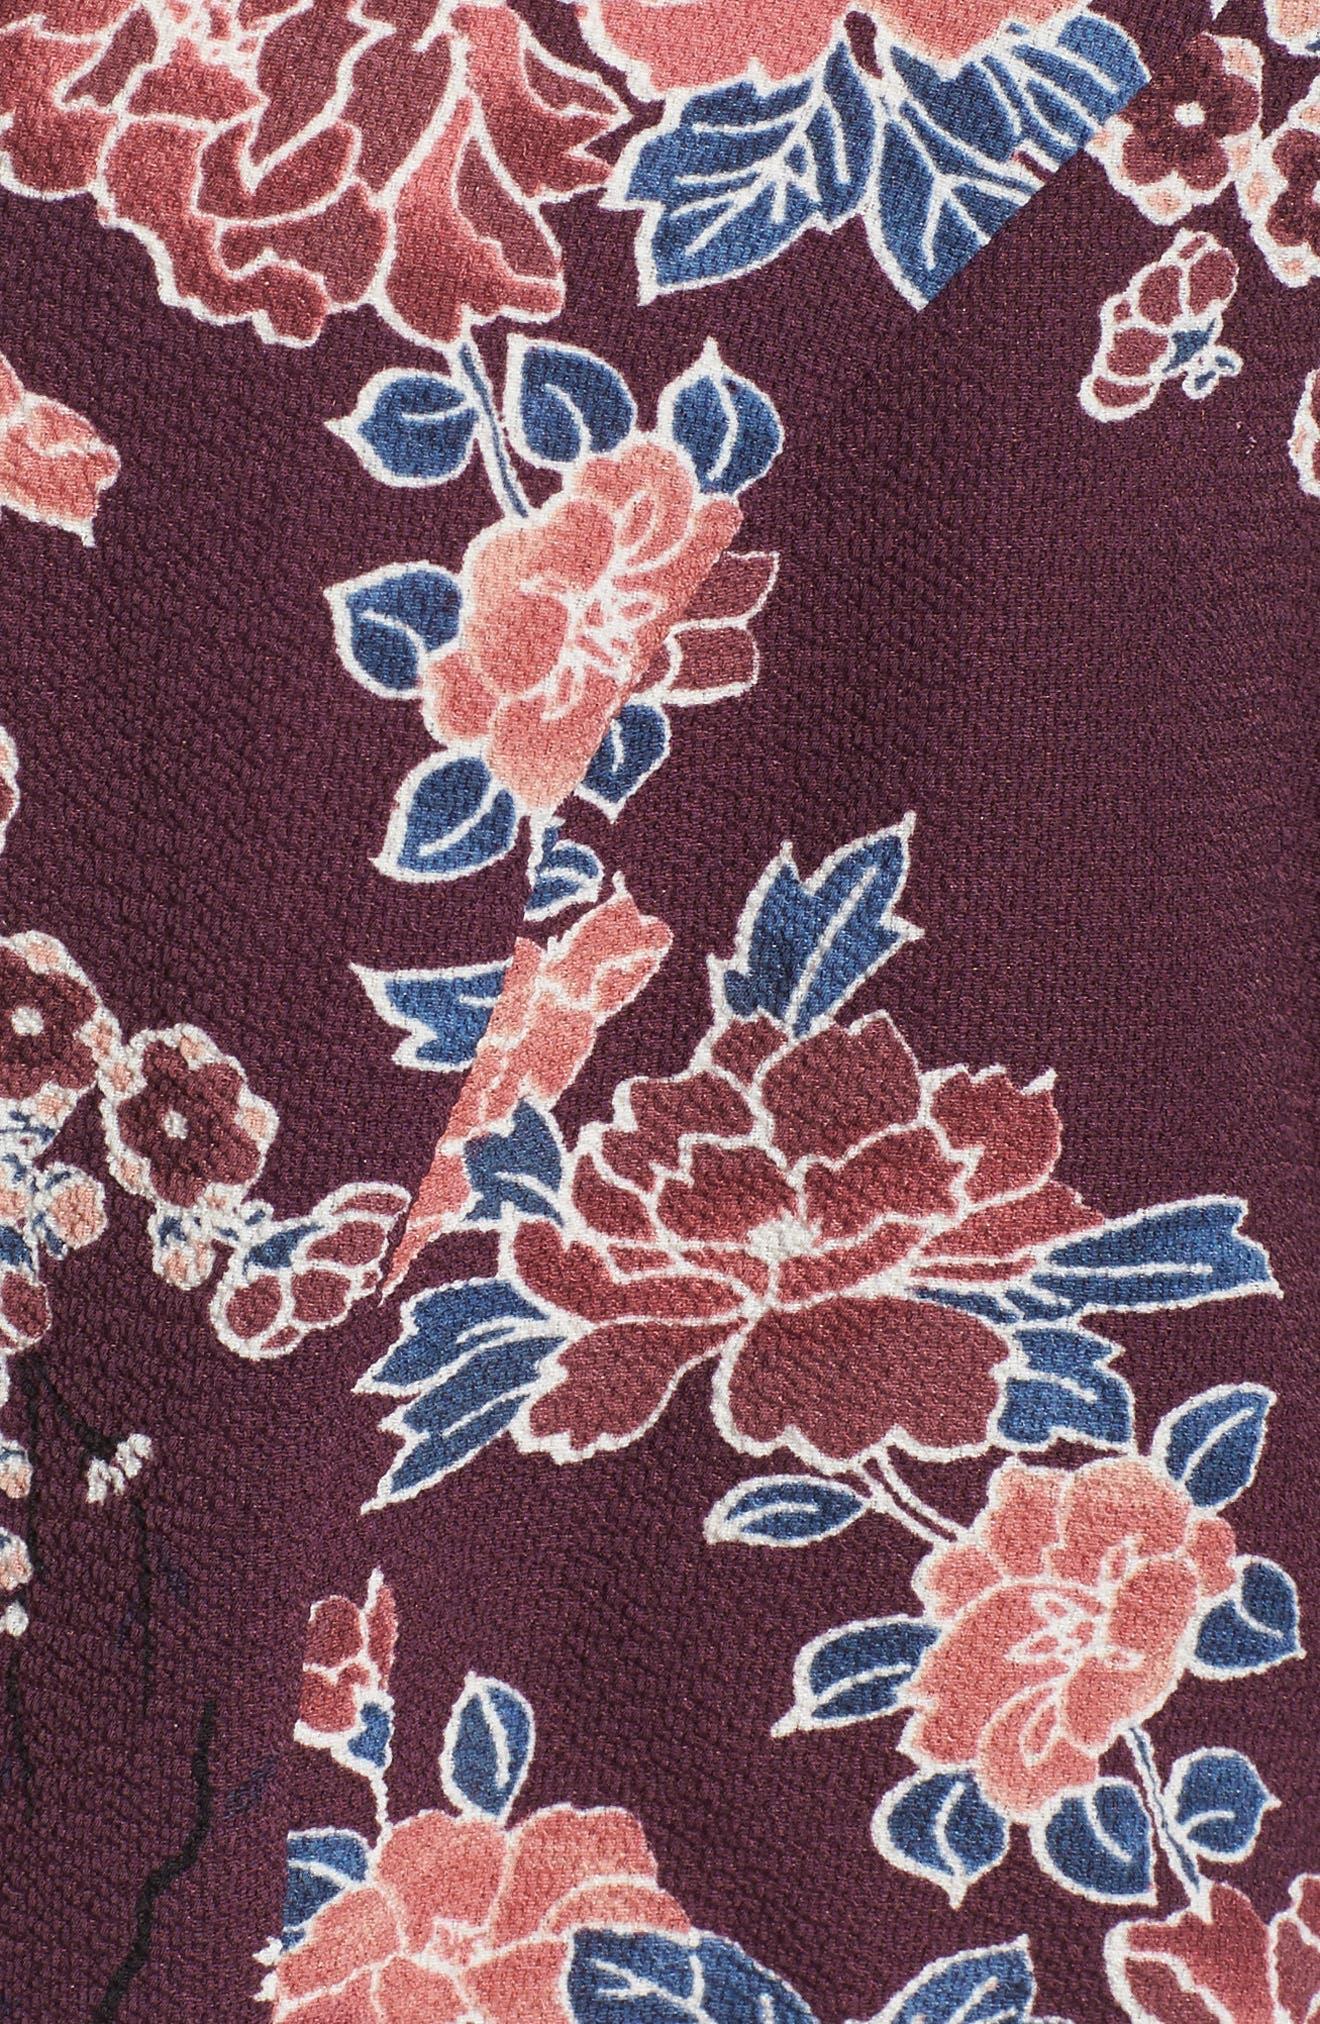 Floral Print Romper,                             Alternate thumbnail 5, color,                             500